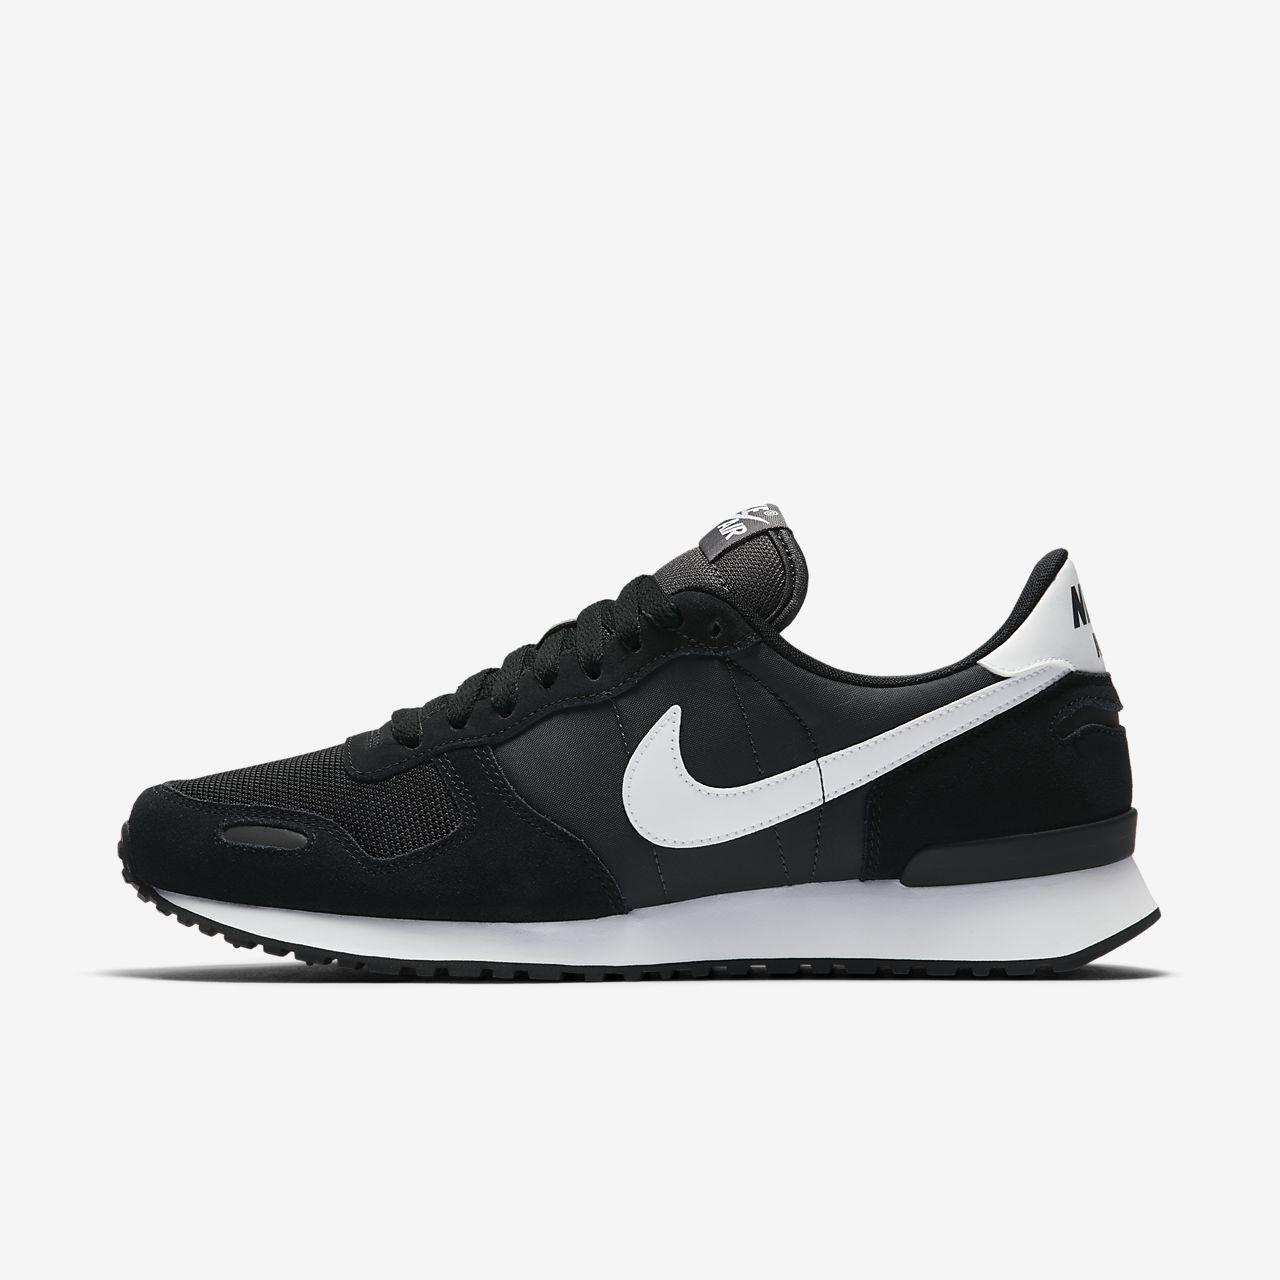 release date c6e2f c60aa Calzado para hombre Nike Air Vortex